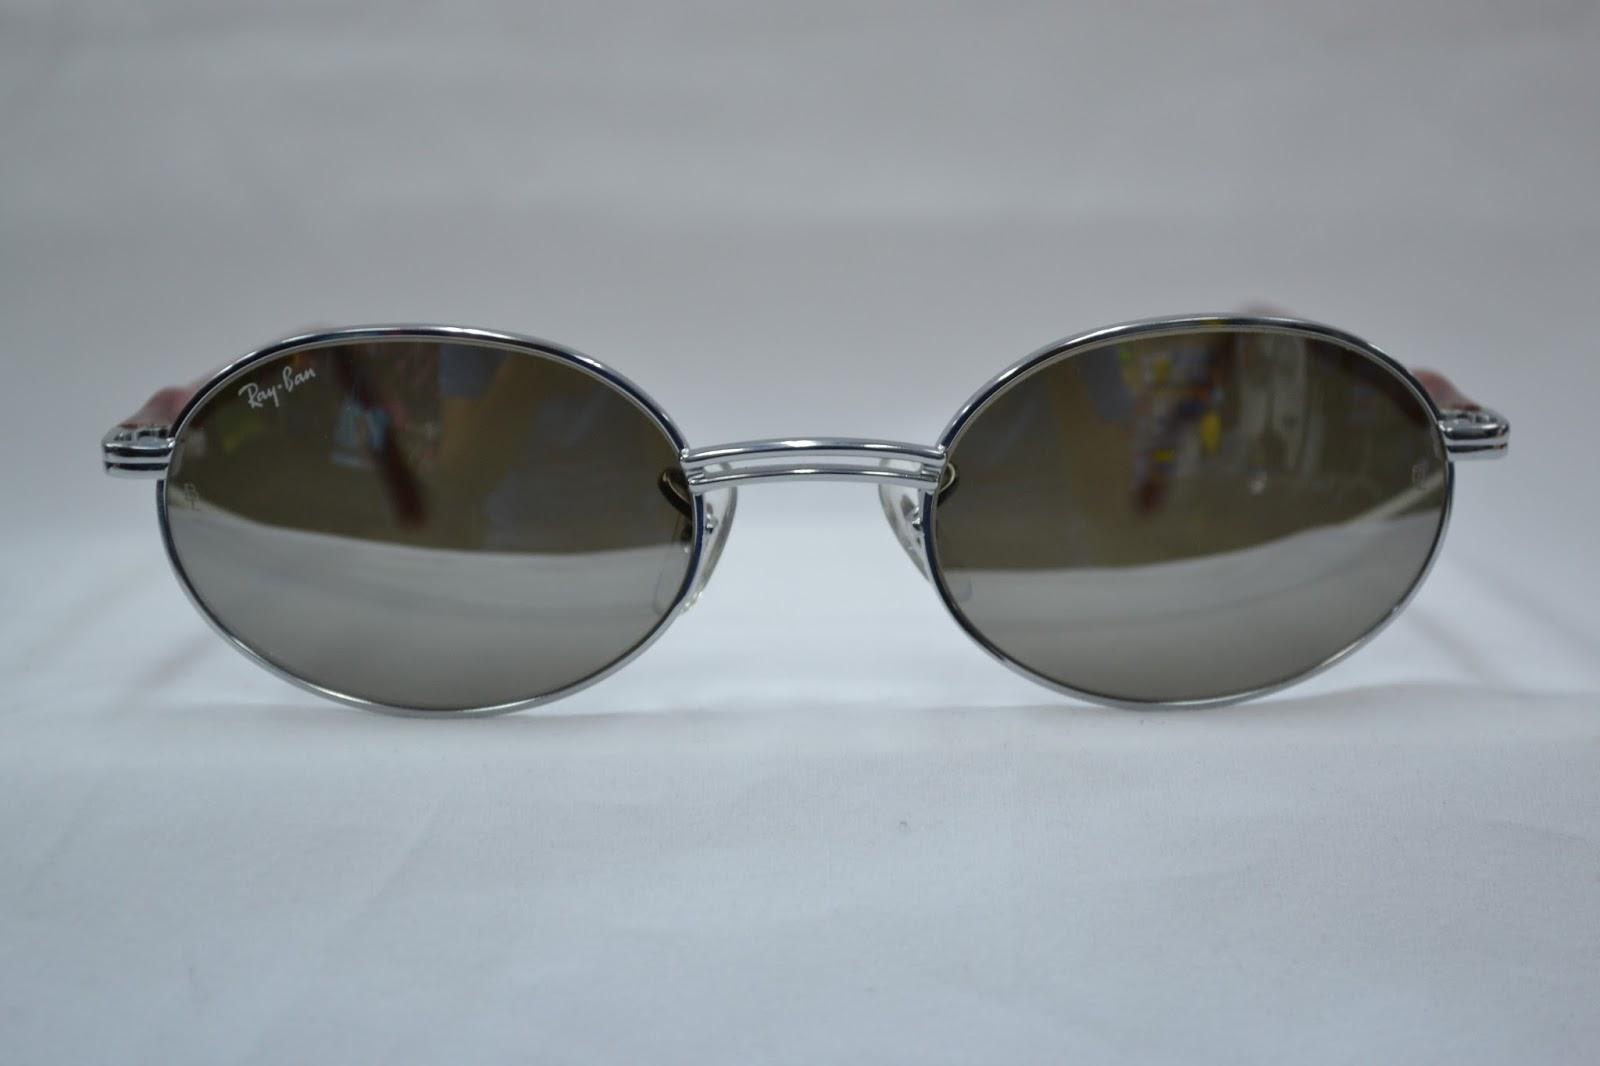 4a9b62e4b19 Vintage sunglass  Vintage Ray Ban Rituals W2545 G31 mirror lens NOS